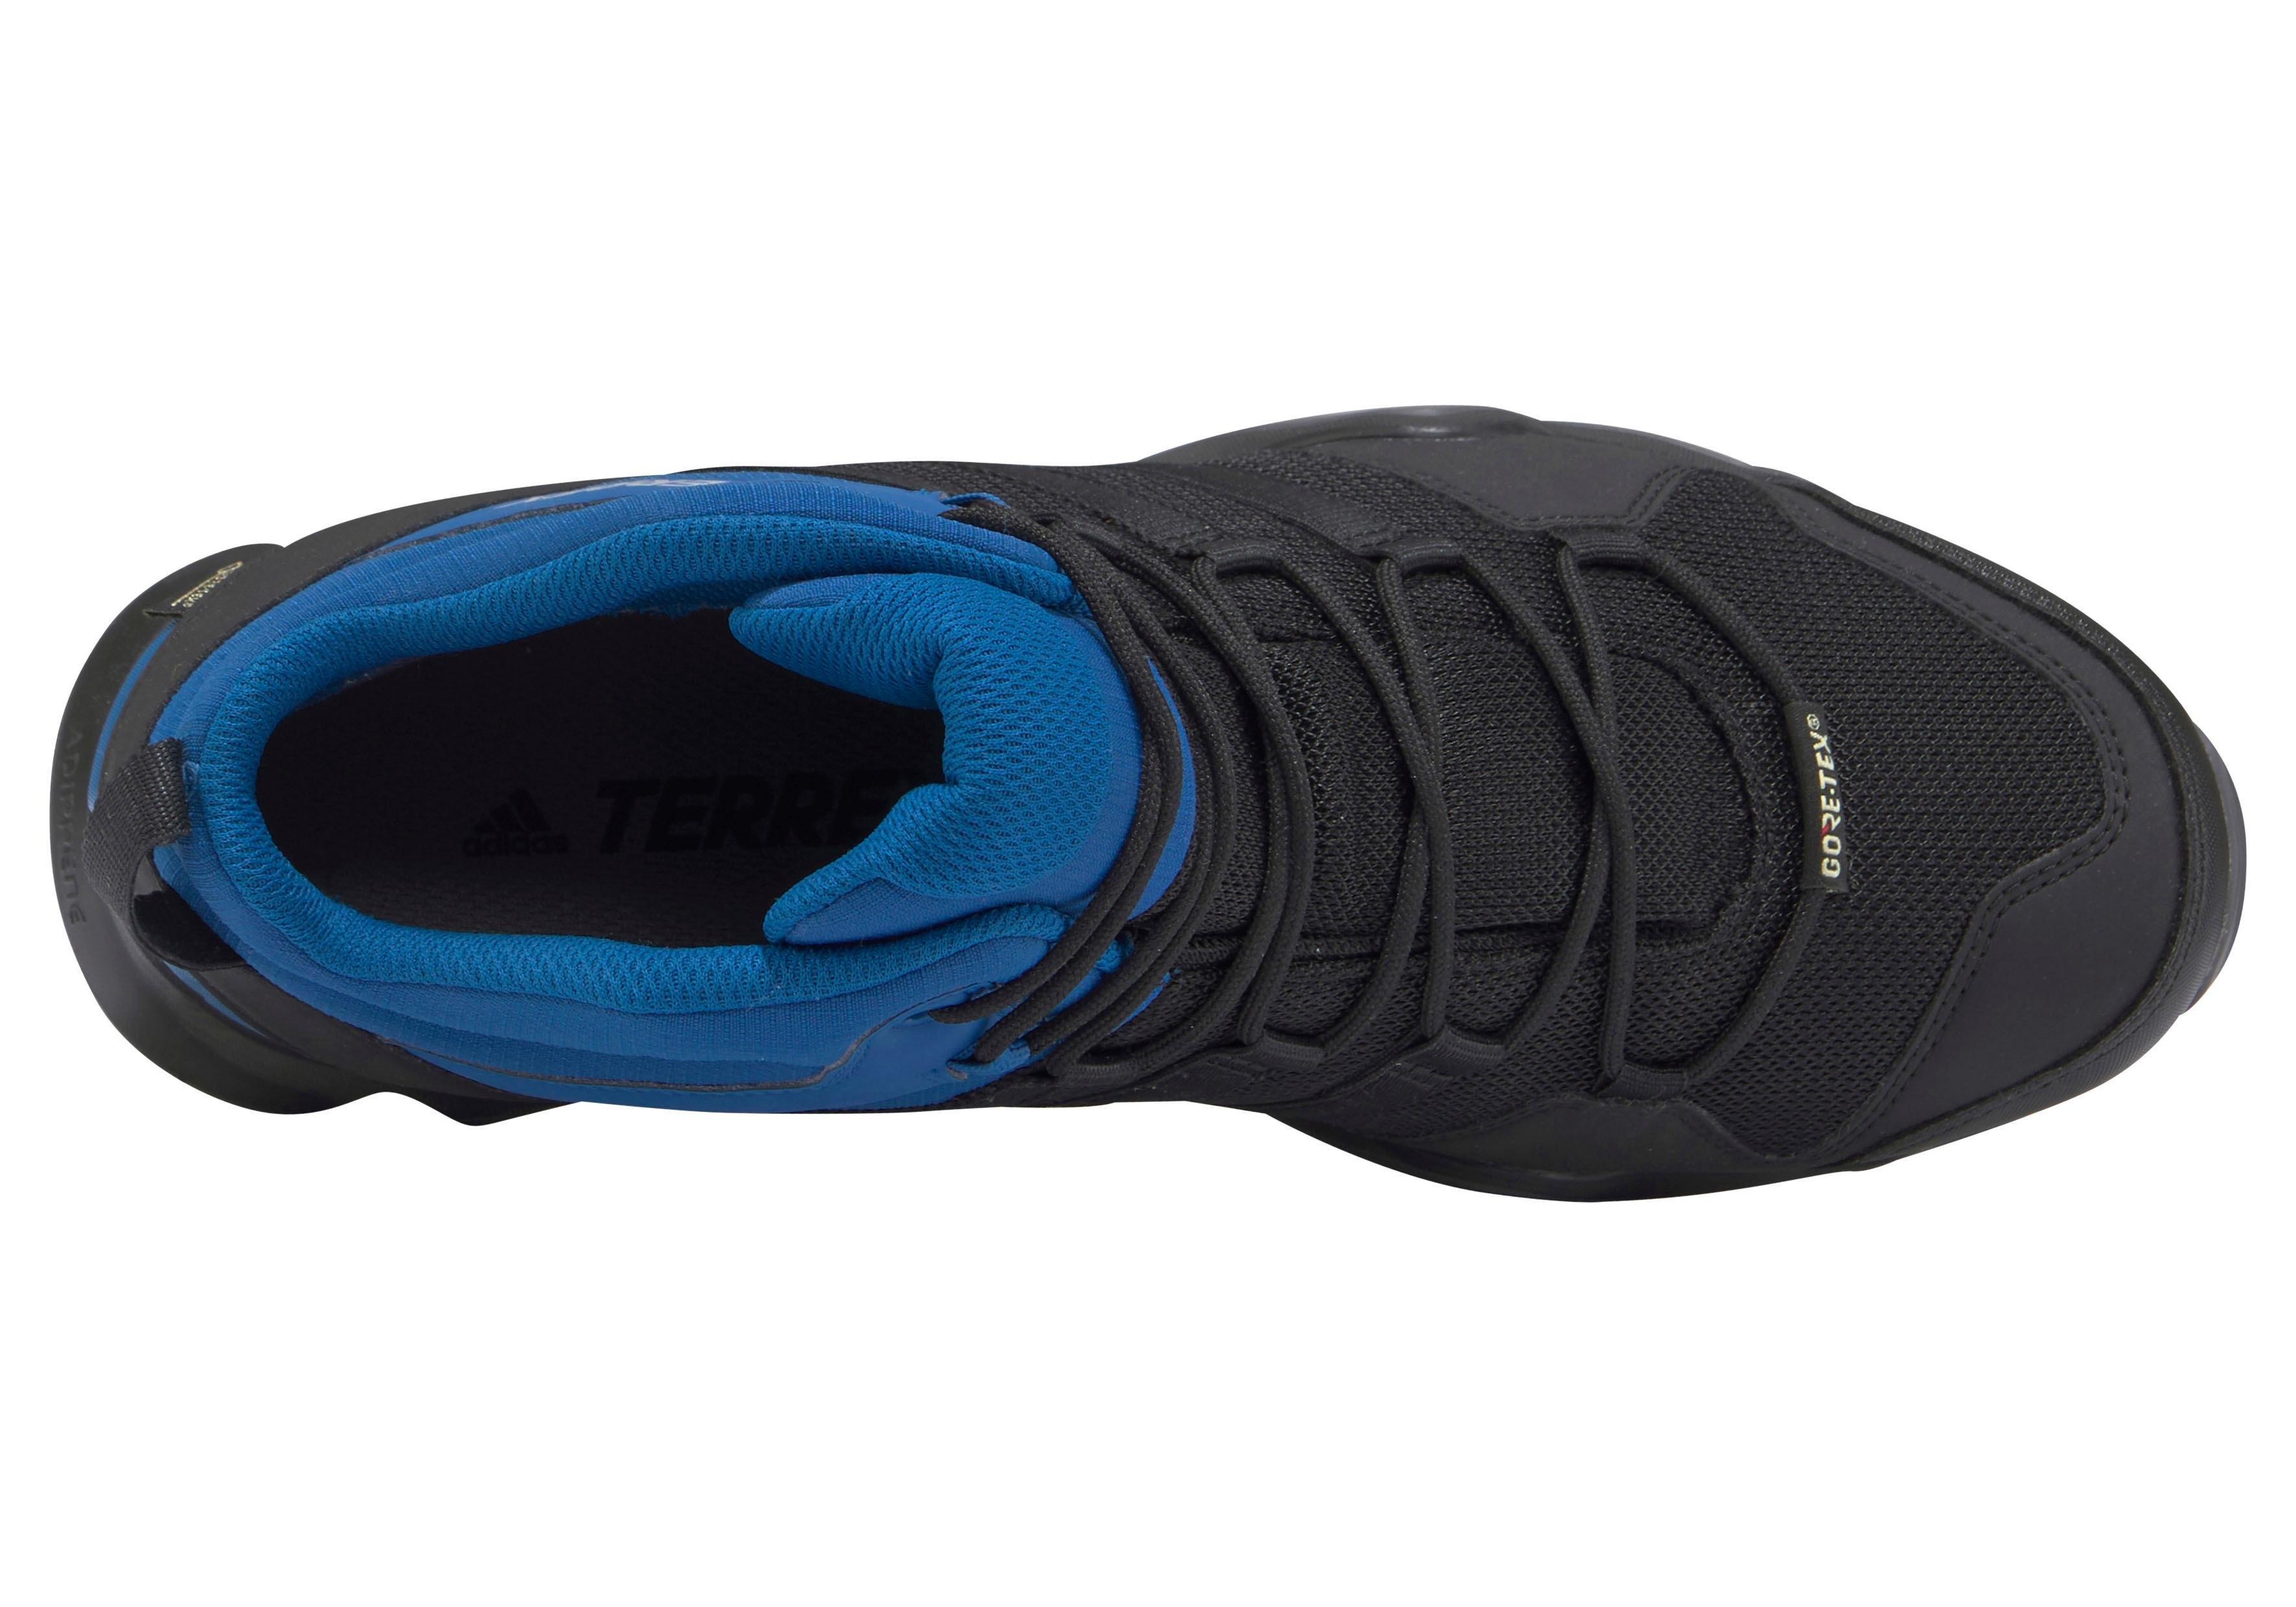 Adidas Goretex Outdoorschoenenterrex Nu Online Performance Kopen Mid Ax2r MGzpjLVqSU